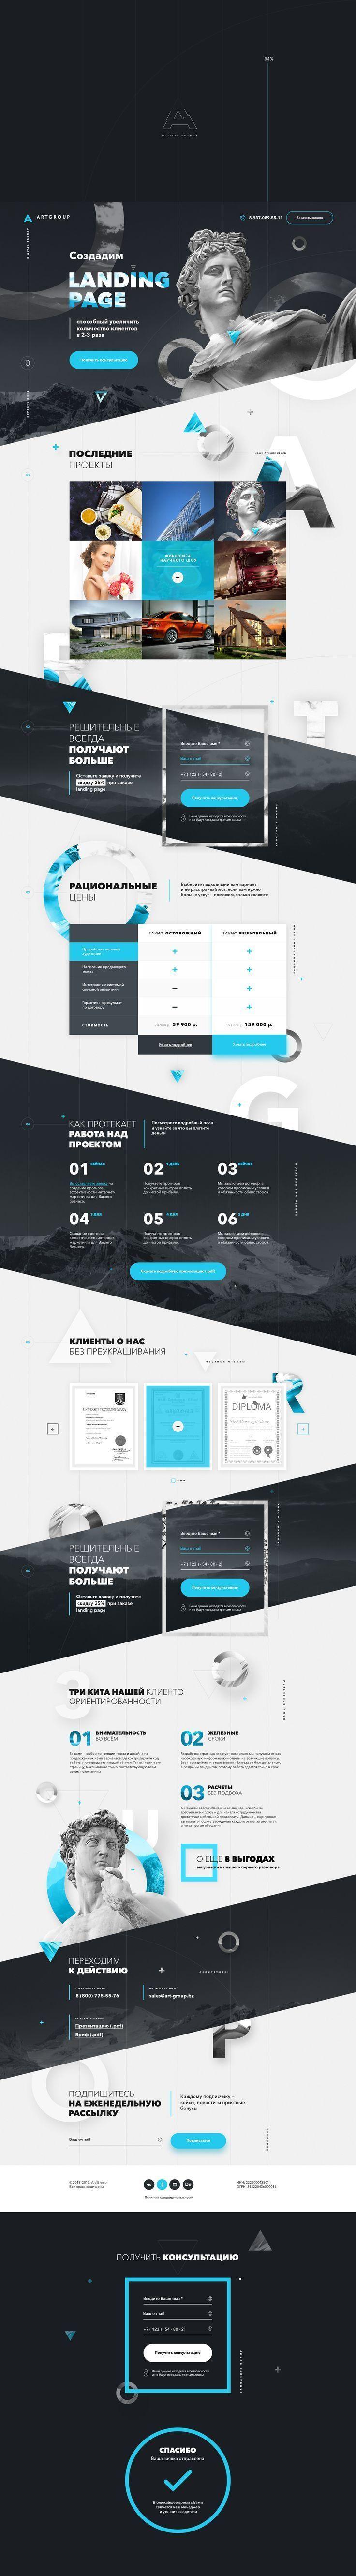 Pin Na Doske Webdesign